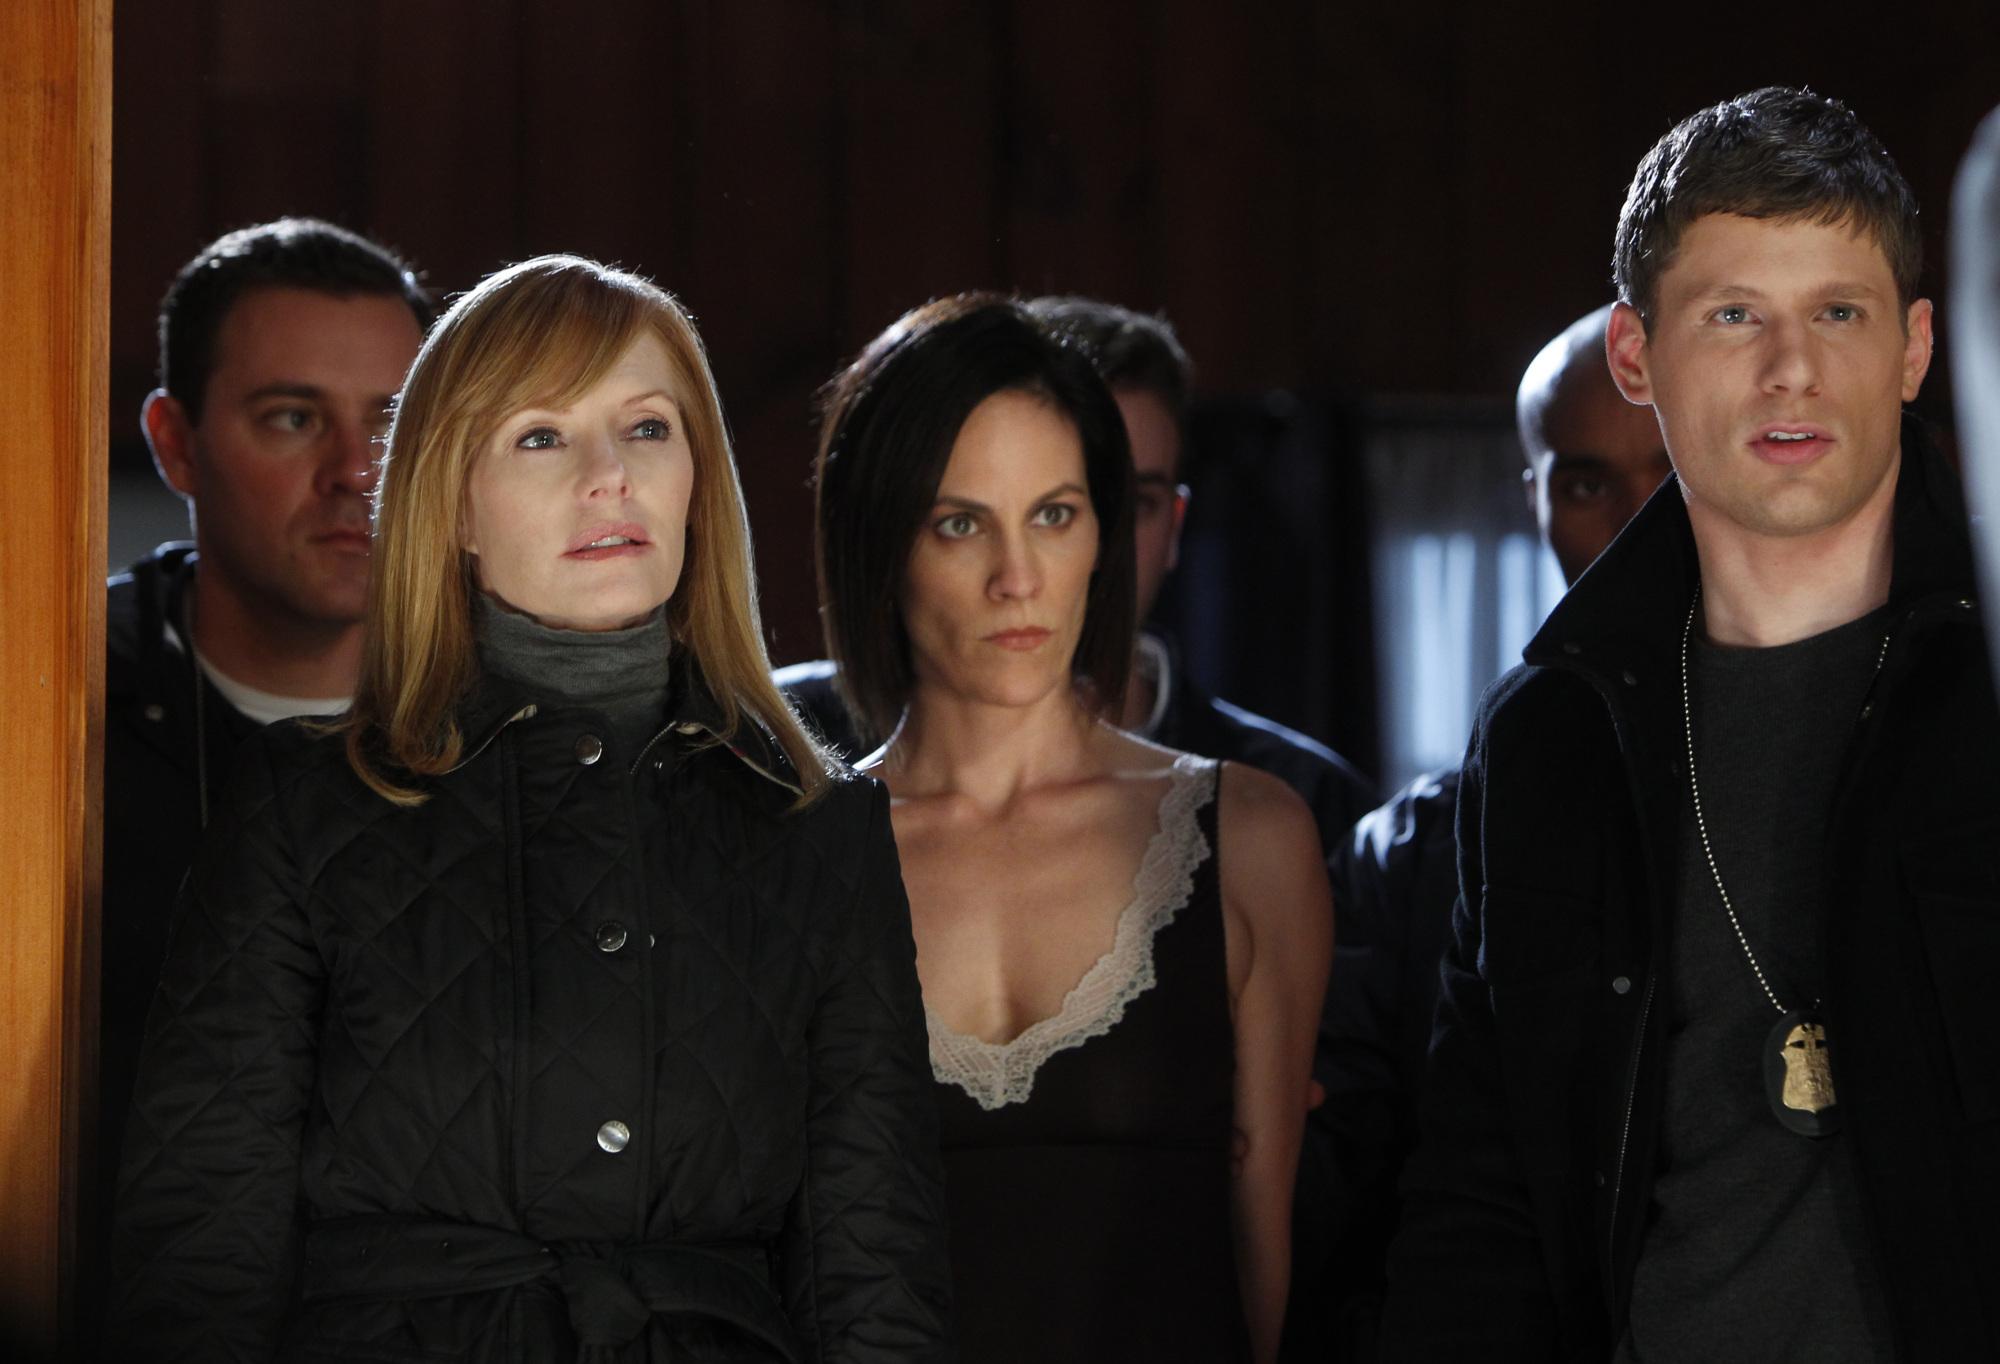 Catherine, Laura and Agent Pratt